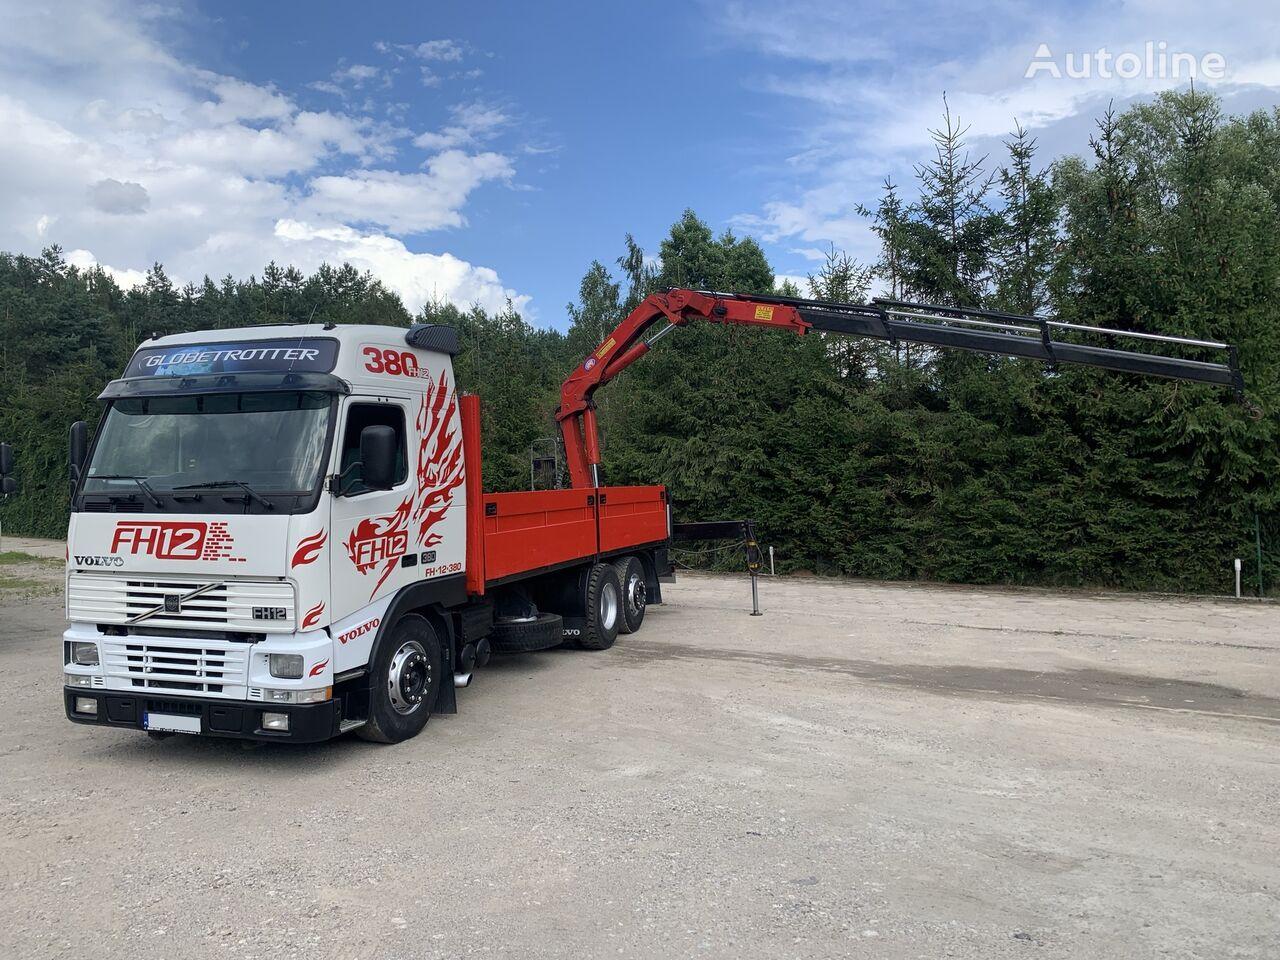 VOLVO FH12 380 KM / 6X2 / SKRZYNIA 6.60 M + ŻURAW HMF / UDŹWIG 4100 KG kamion s ravnom platformom